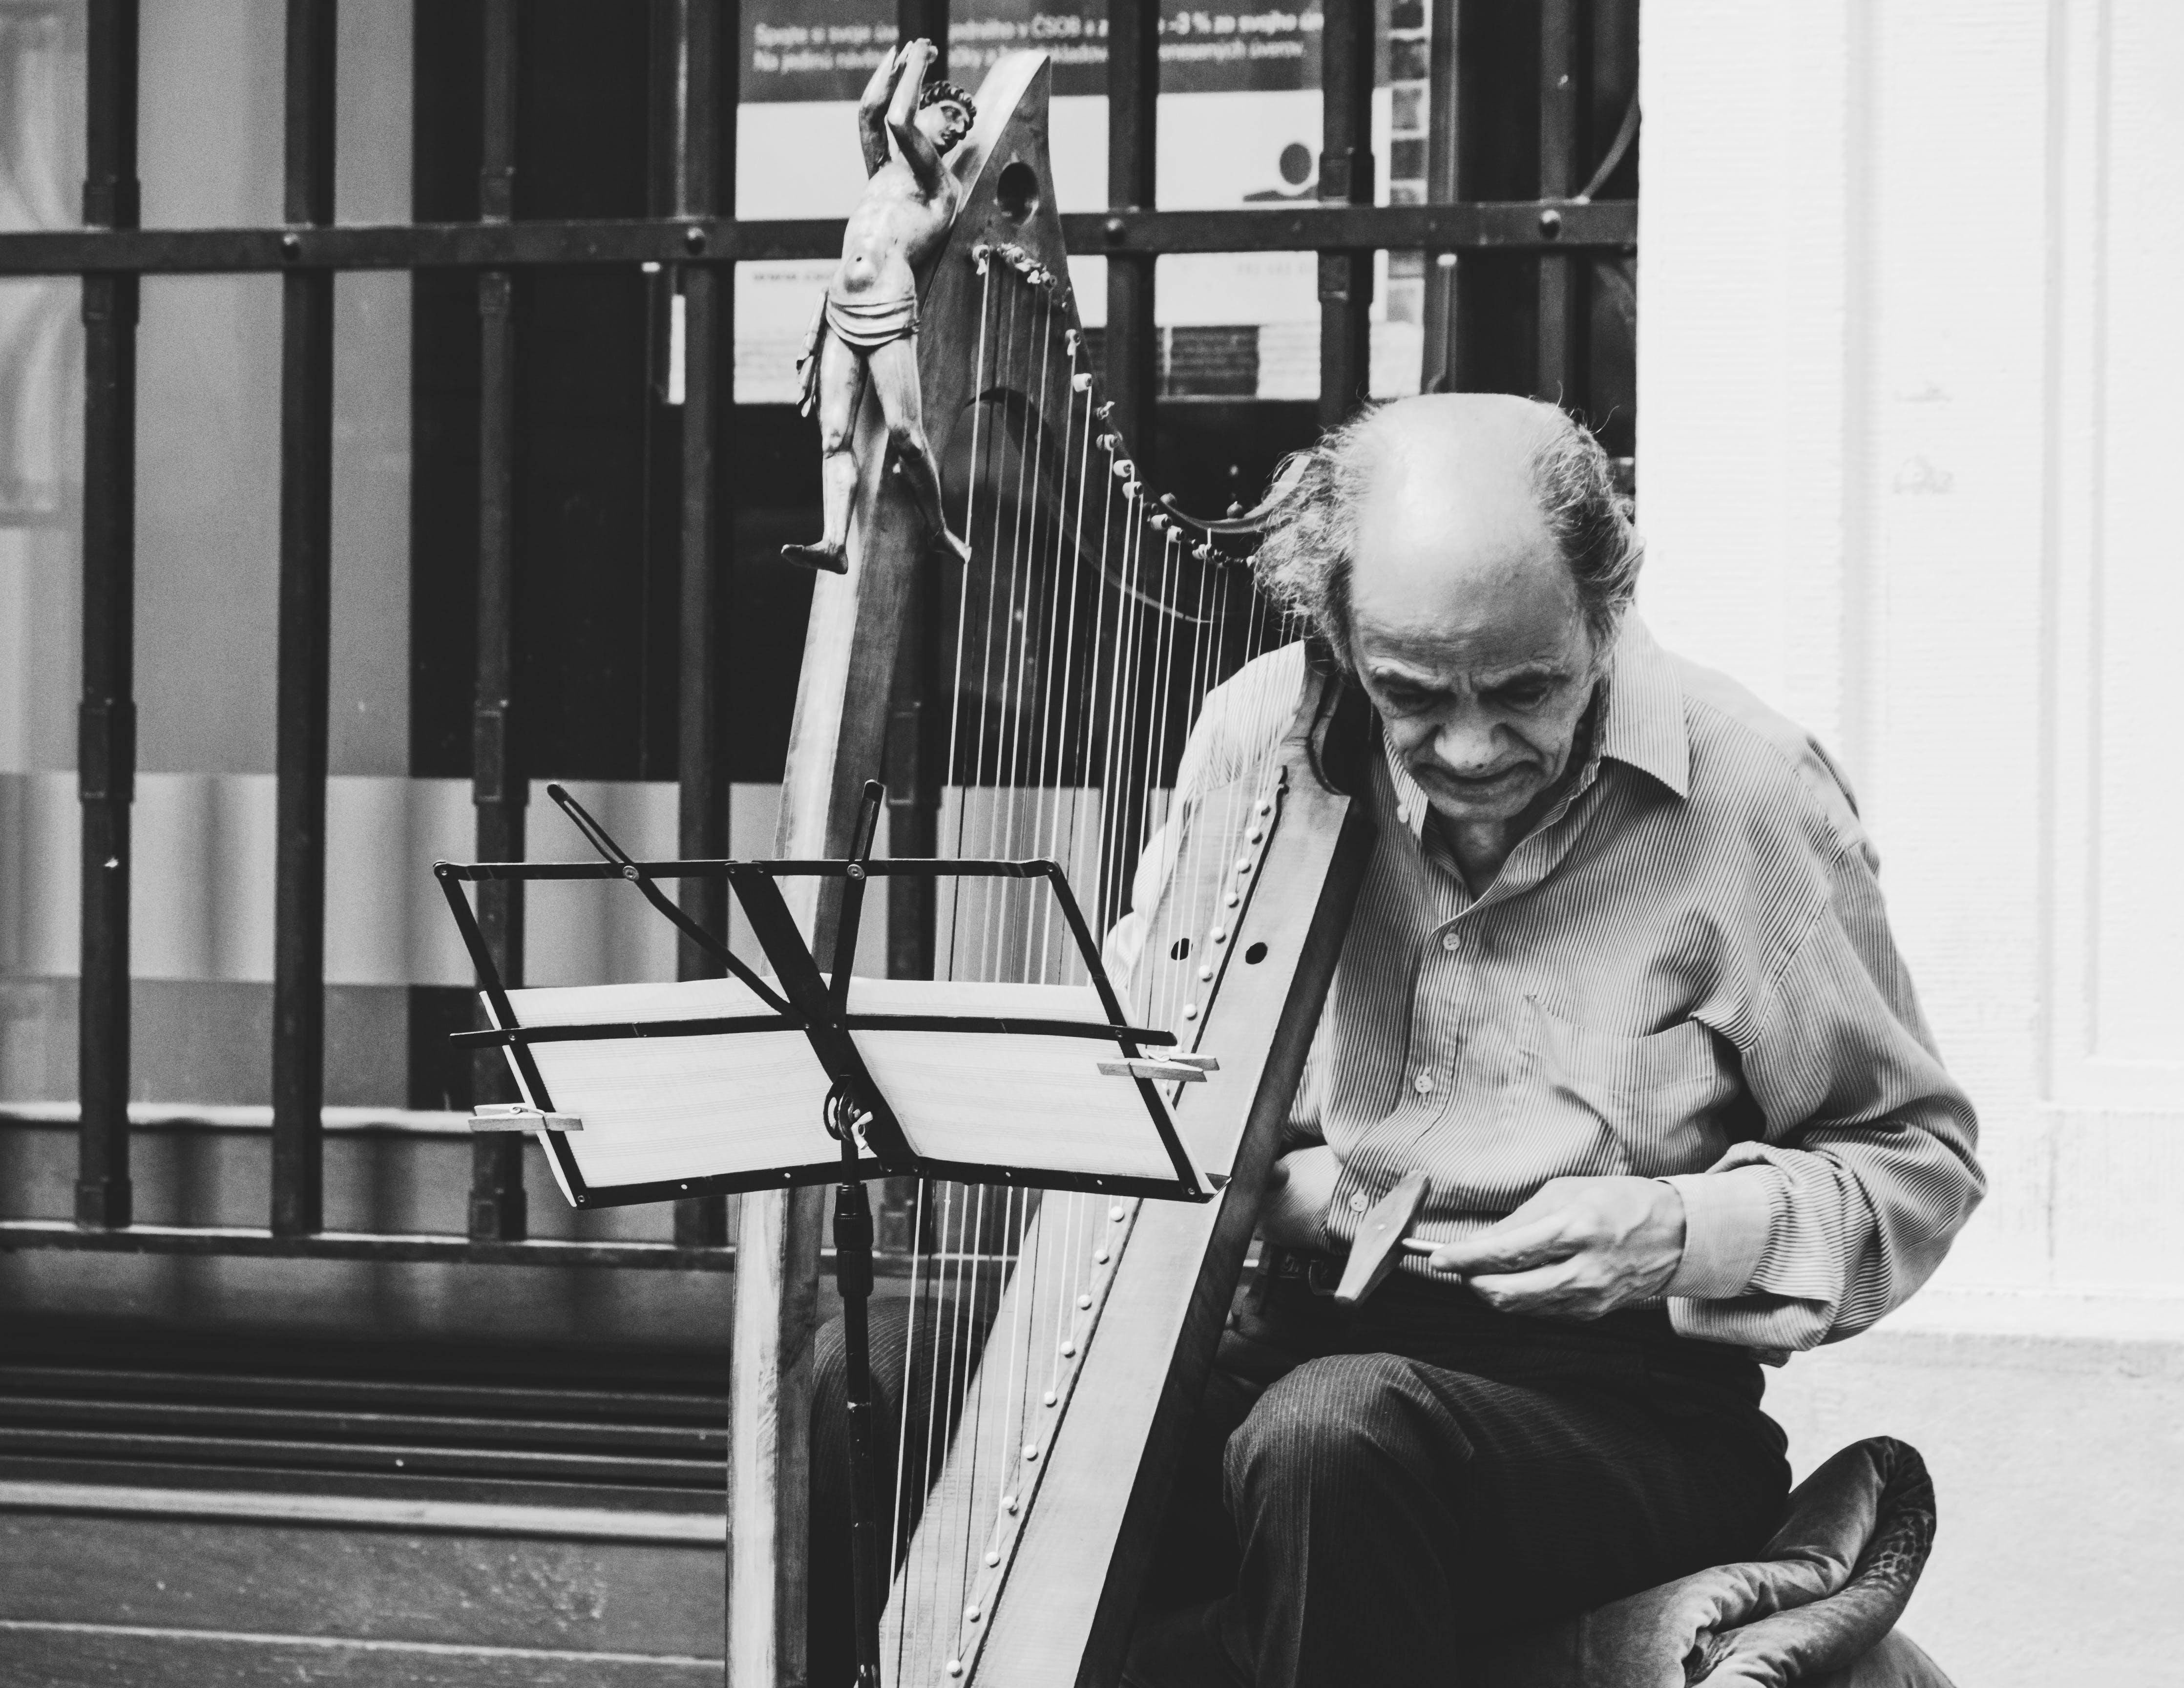 Greyscale Photo of Man Holding Harp